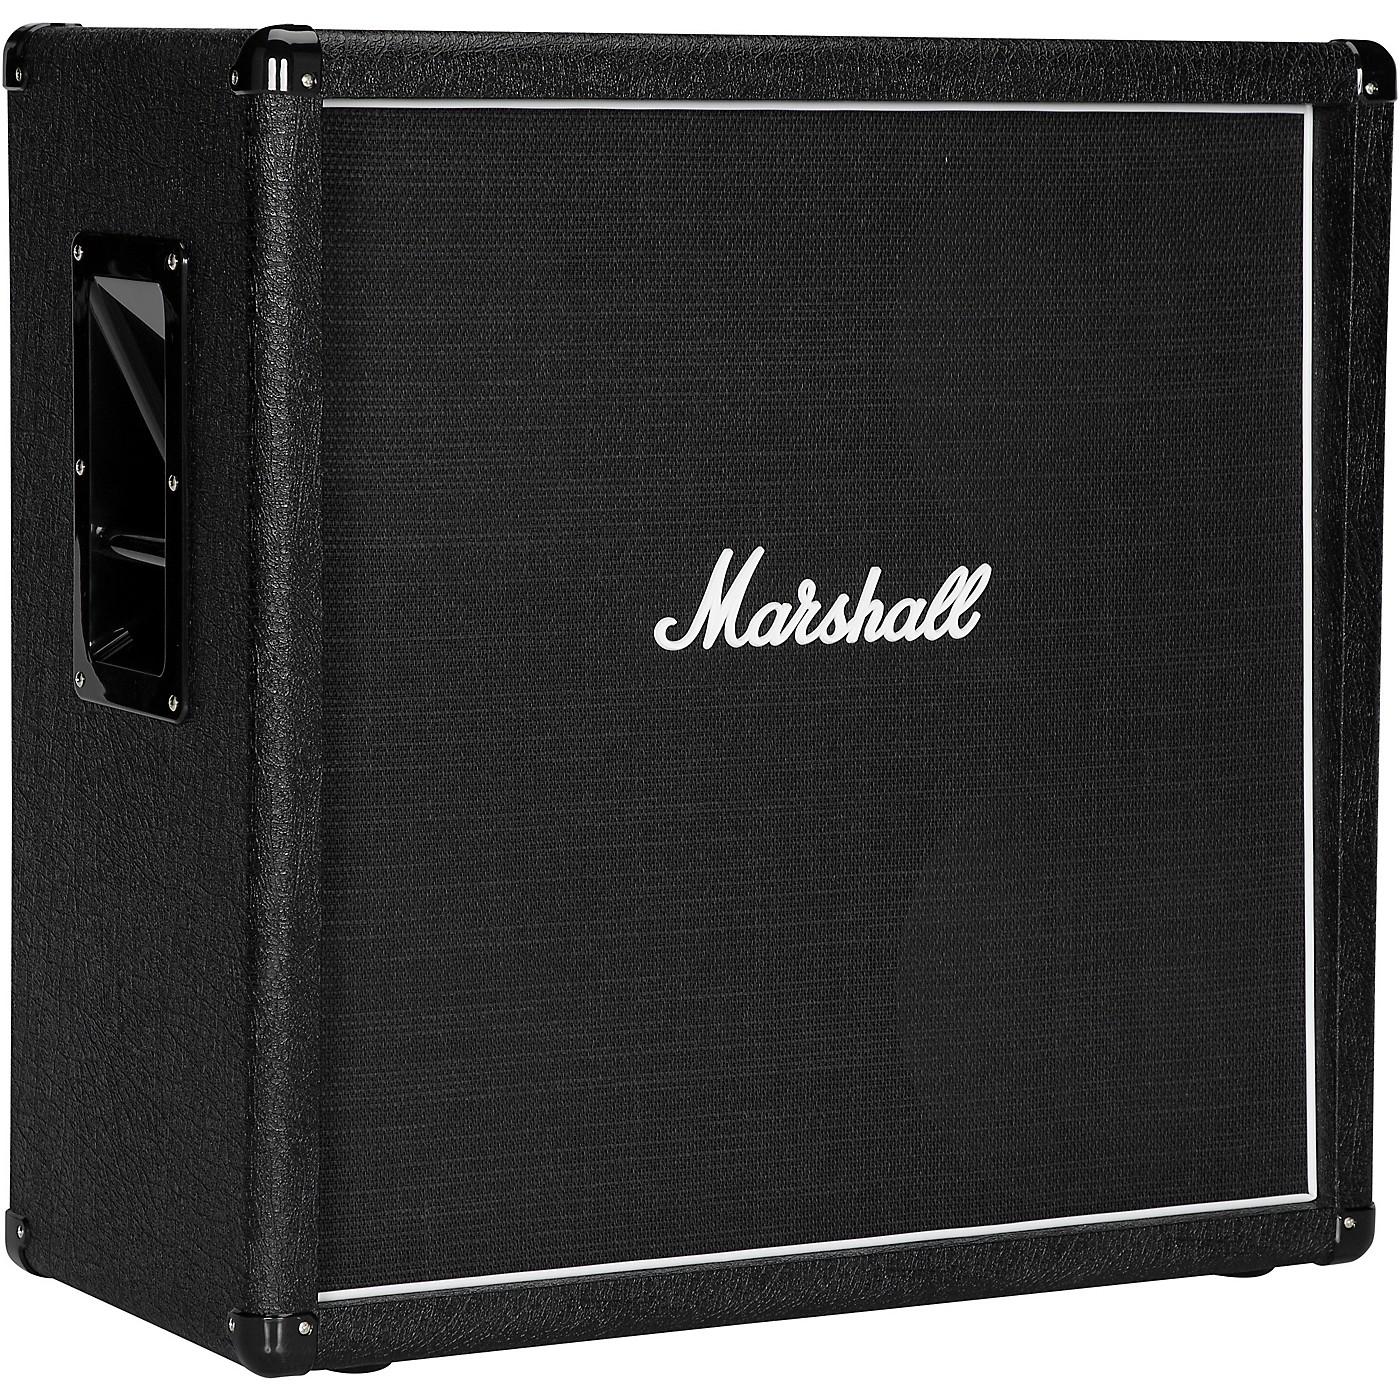 Marshall MX412BR 240W 4x12 Straight Guitar Speaker Cab thumbnail